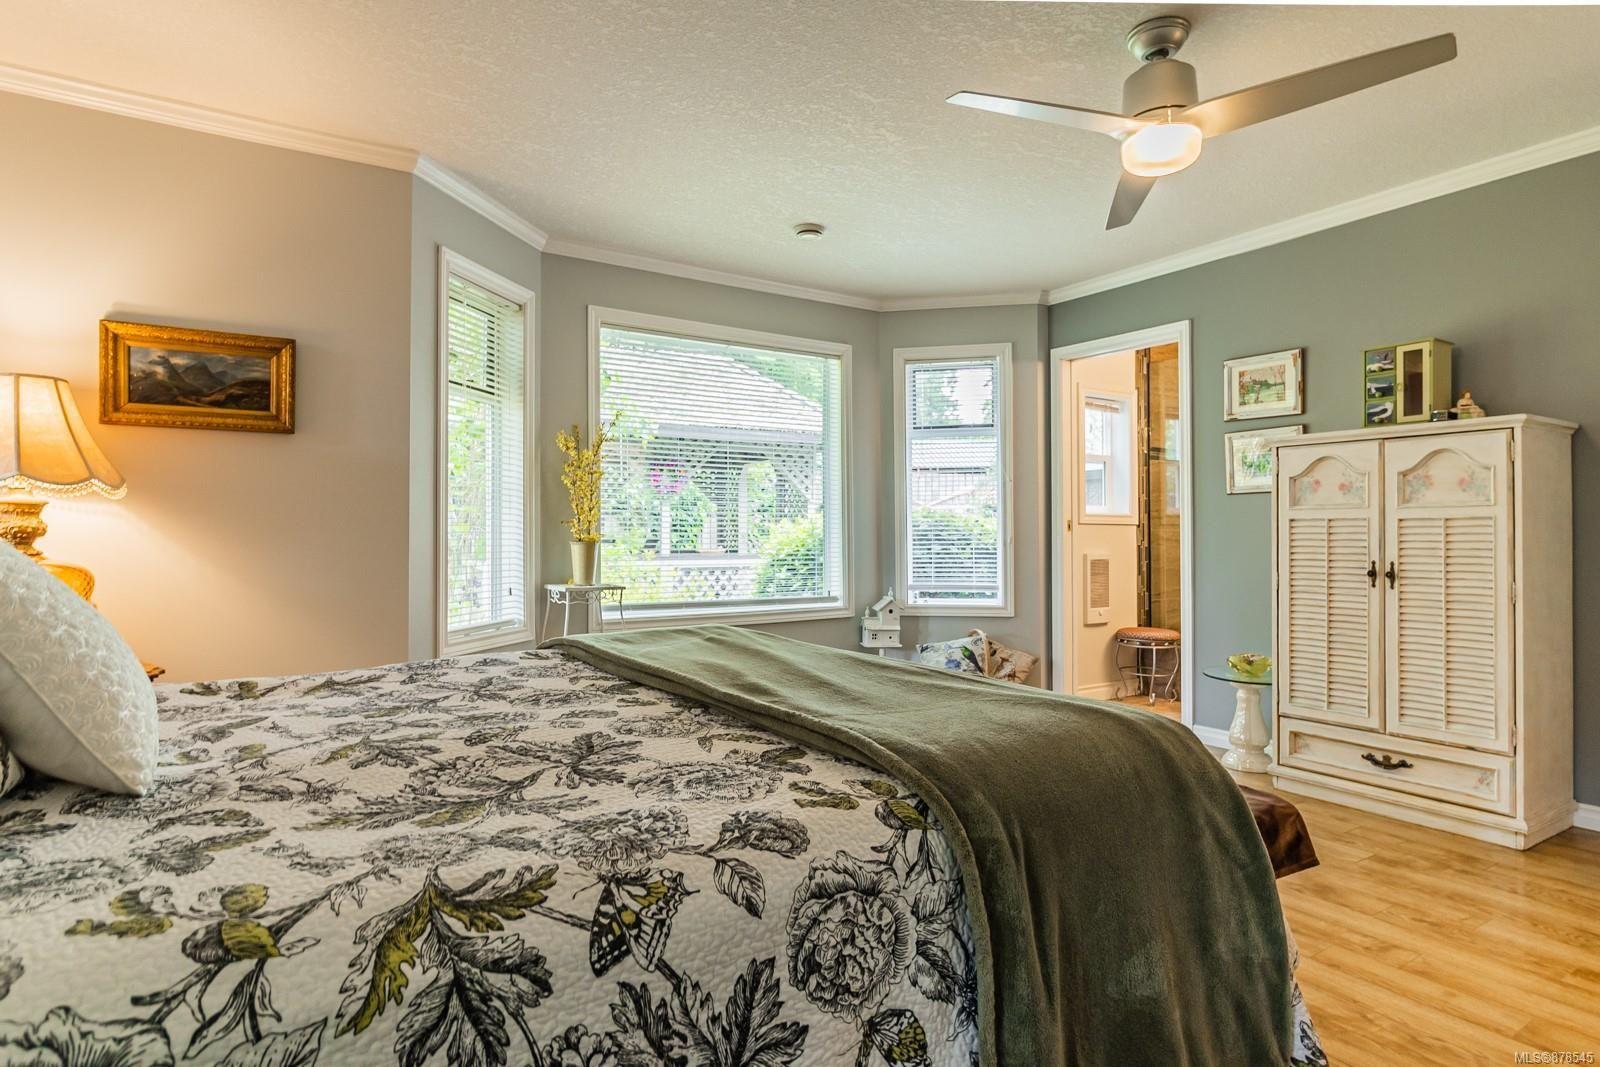 Photo 19: Photos: 1070 Symons Cres in : PQ Qualicum Beach House for sale (Parksville/Qualicum)  : MLS®# 878545